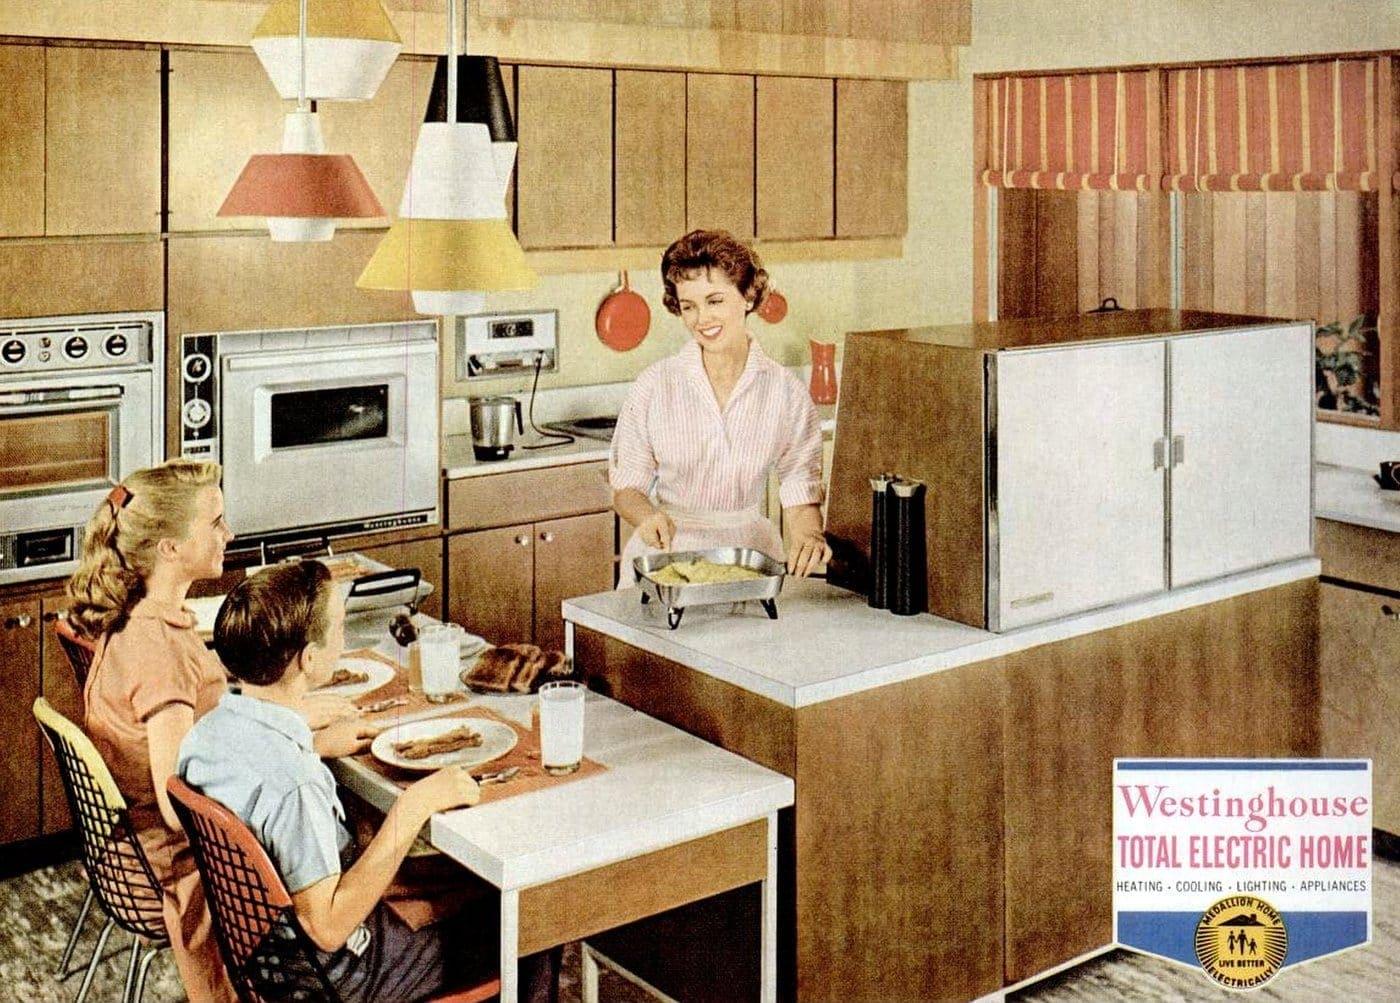 1959 Electic living home - Kitchen scene